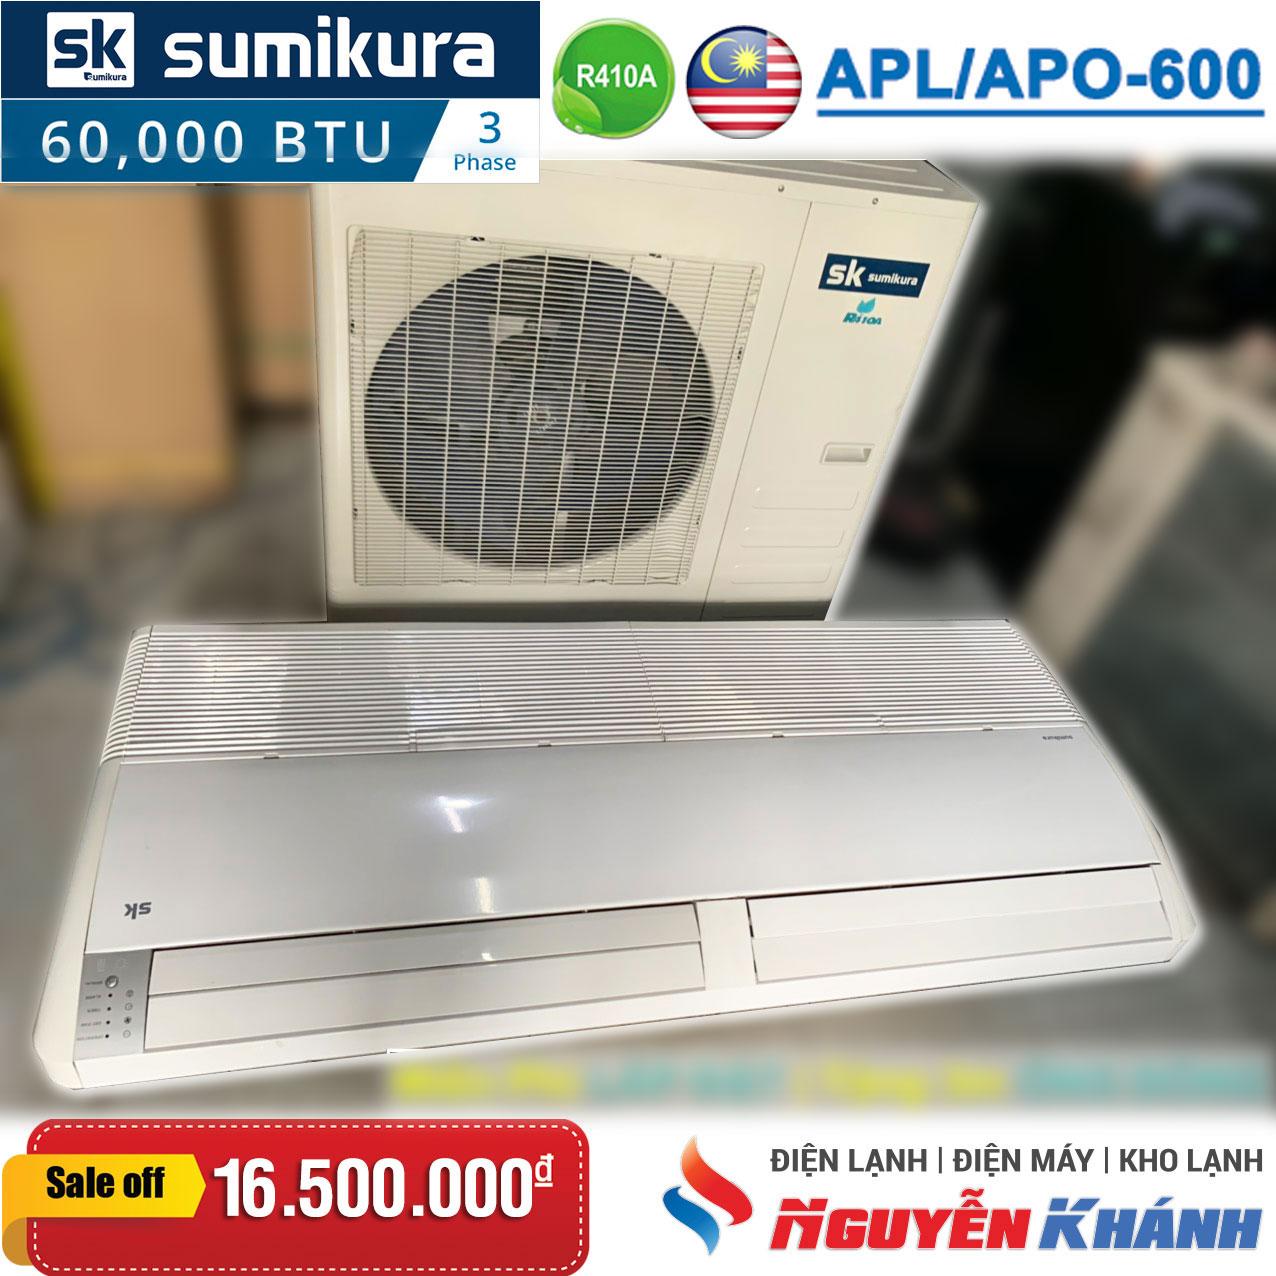 Máy lạnh áp trần Sumikura APL/APO-600 (6.0Hp)